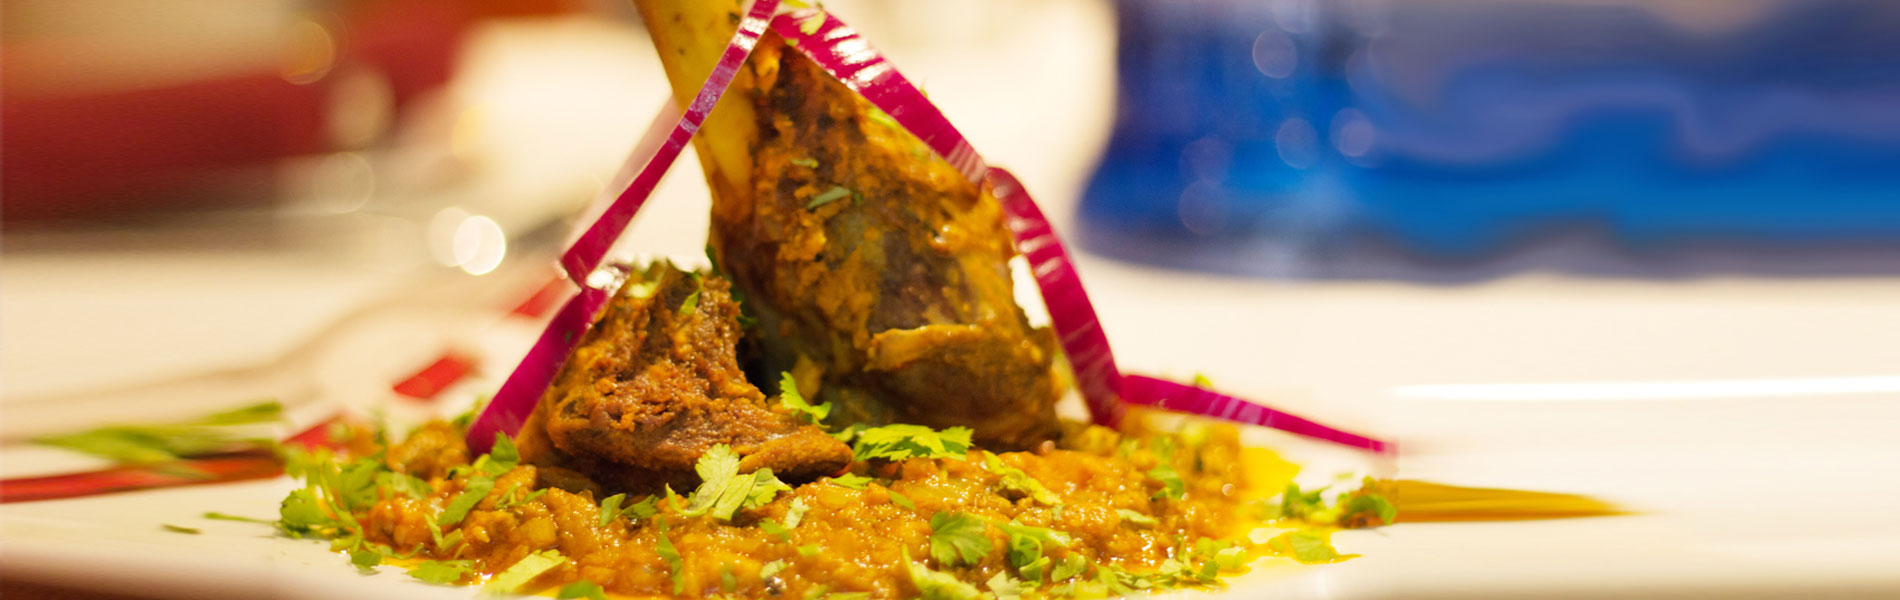 Indiluxe Indian Restaurant